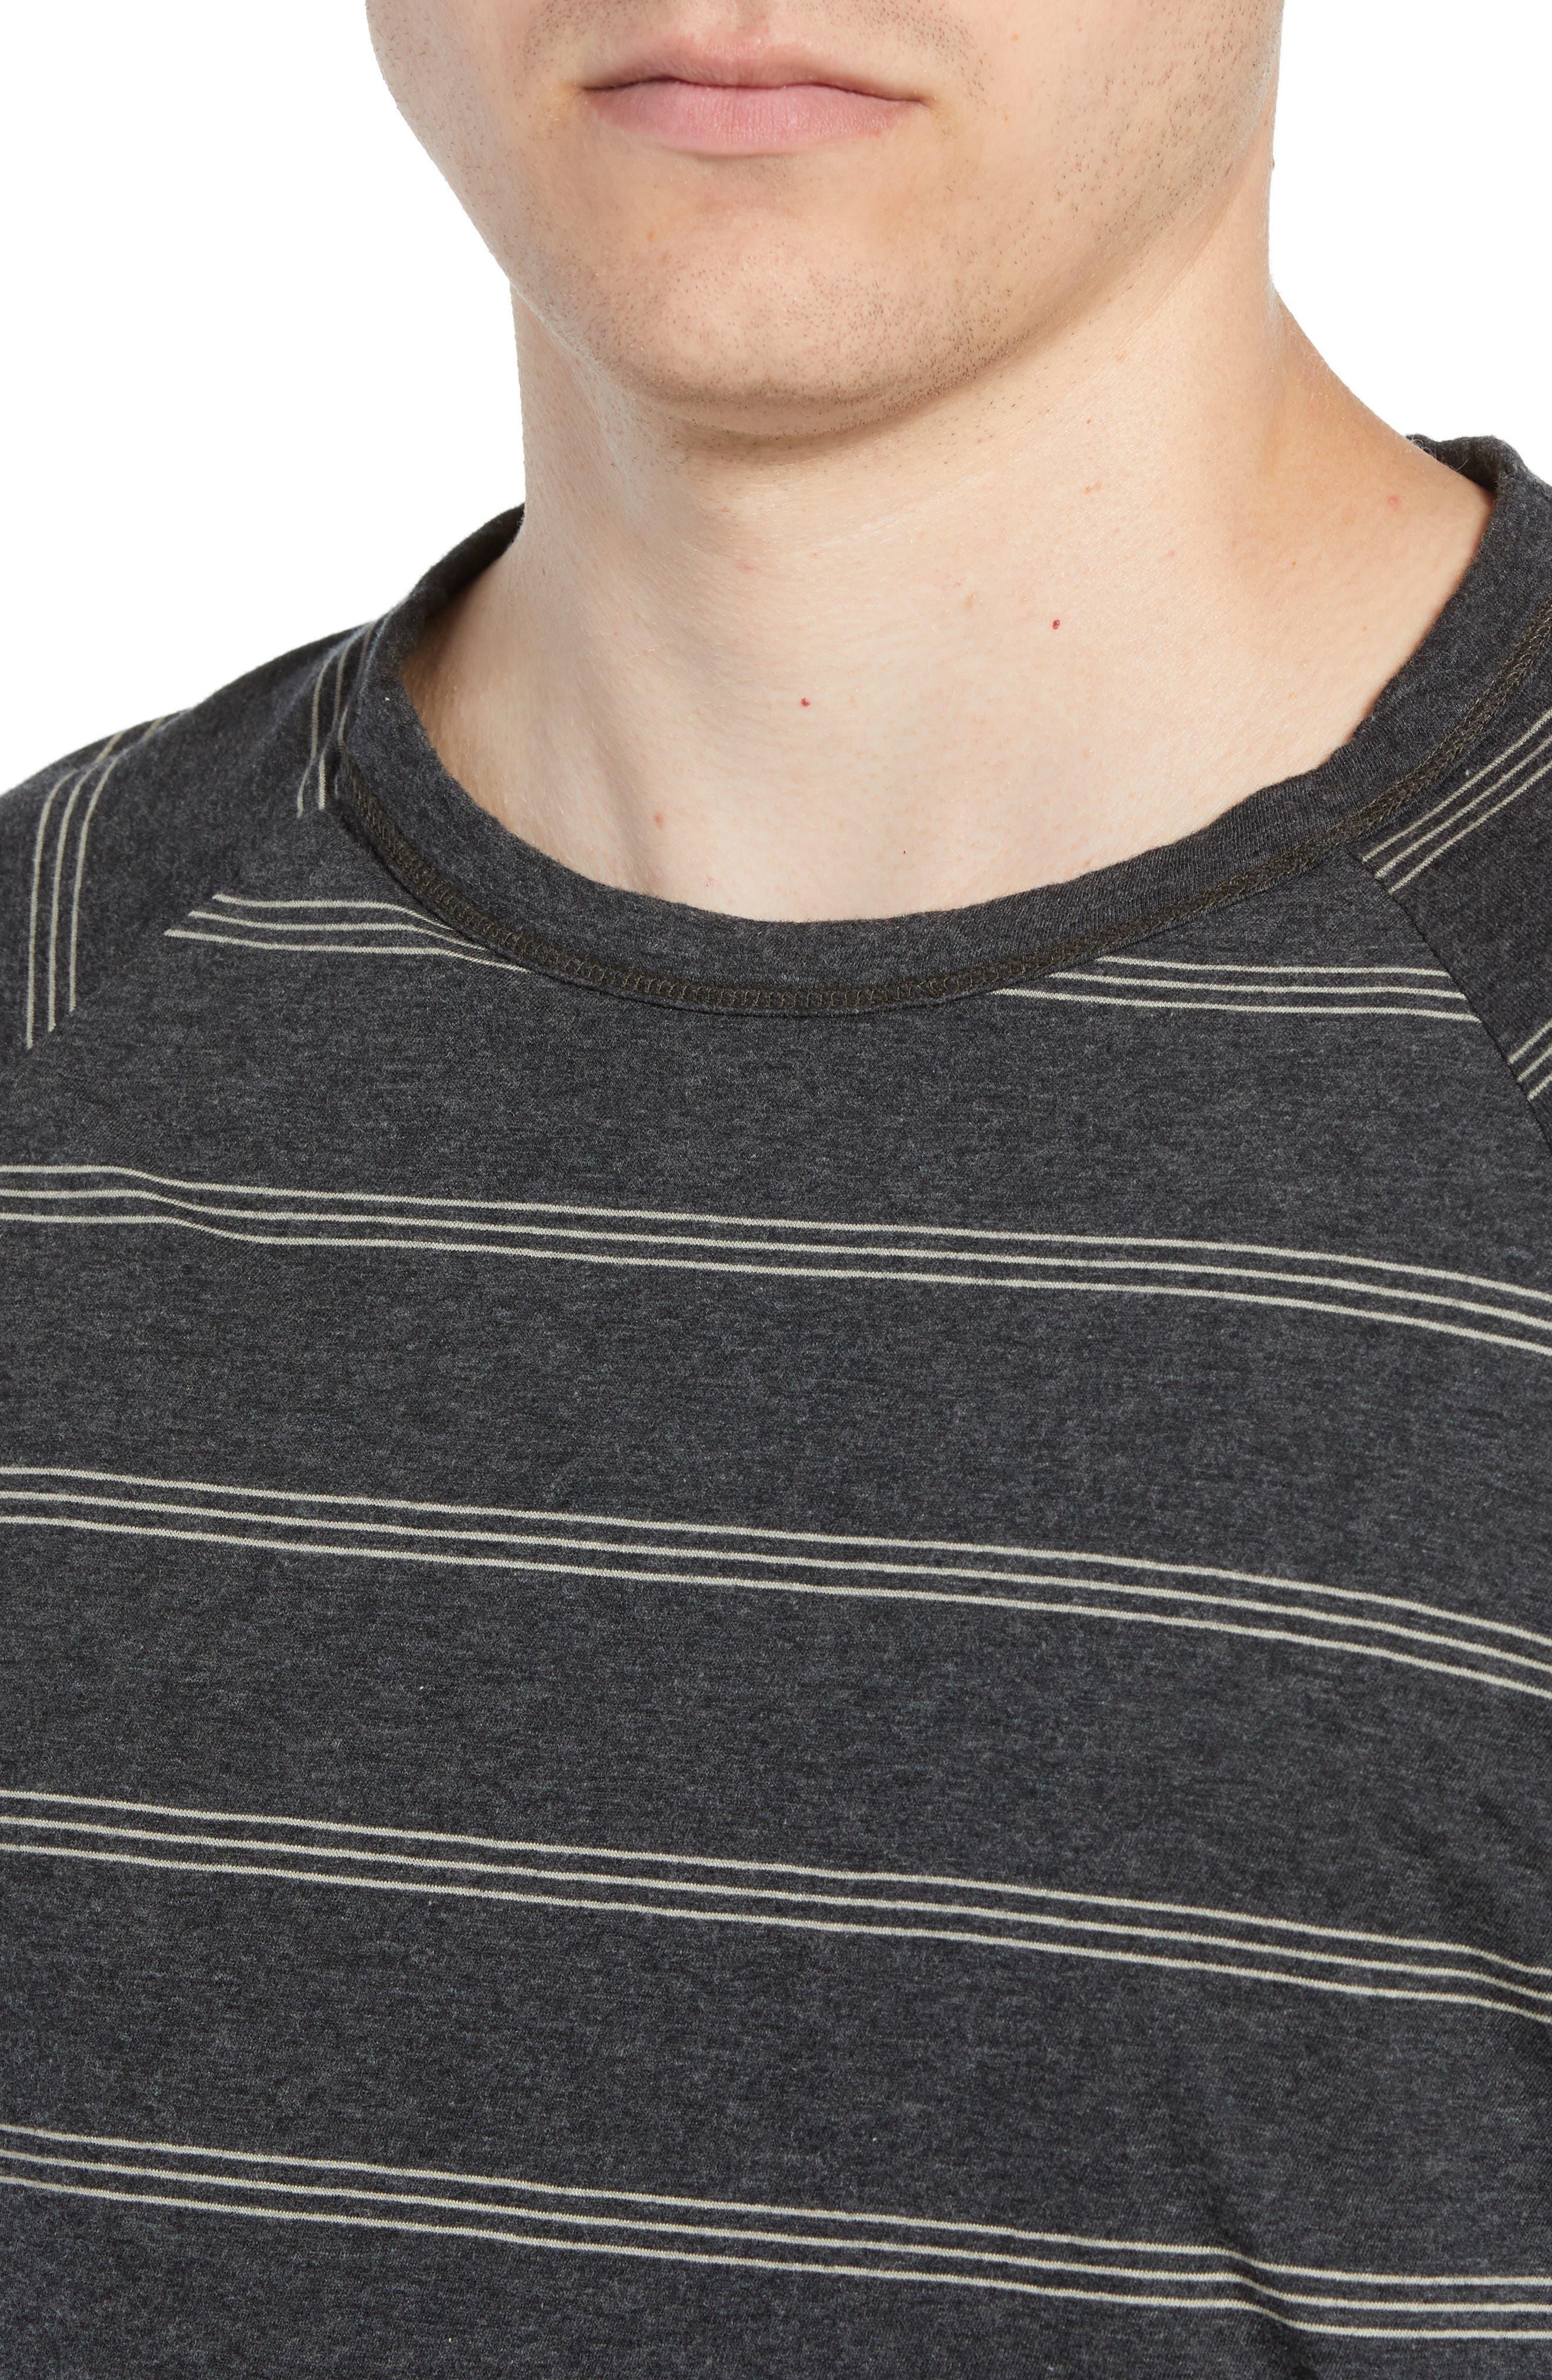 Gunnison Reversible Raglan Sleeve T-Shirt,                             Alternate thumbnail 5, color,                             PHANTOM HEATHER